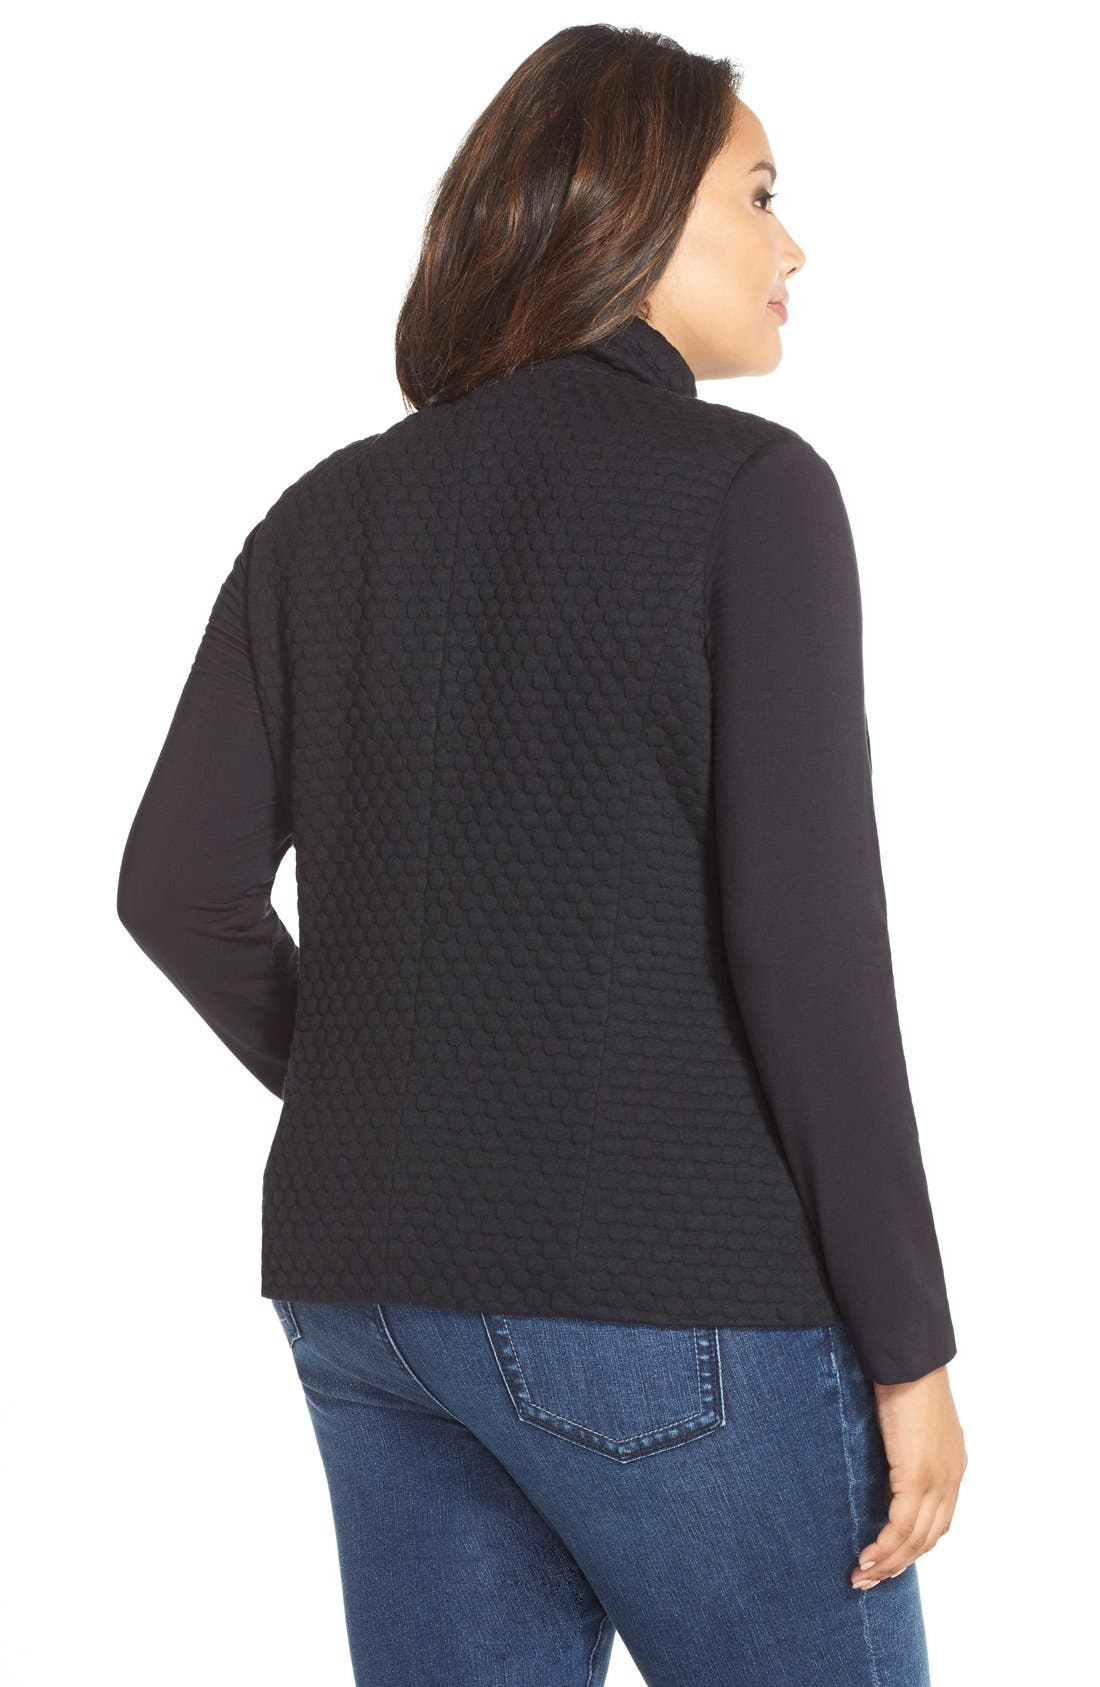 'Bridgette' Textured KnitJacket,                             Alternate thumbnail 2, color,                             Black Bubble